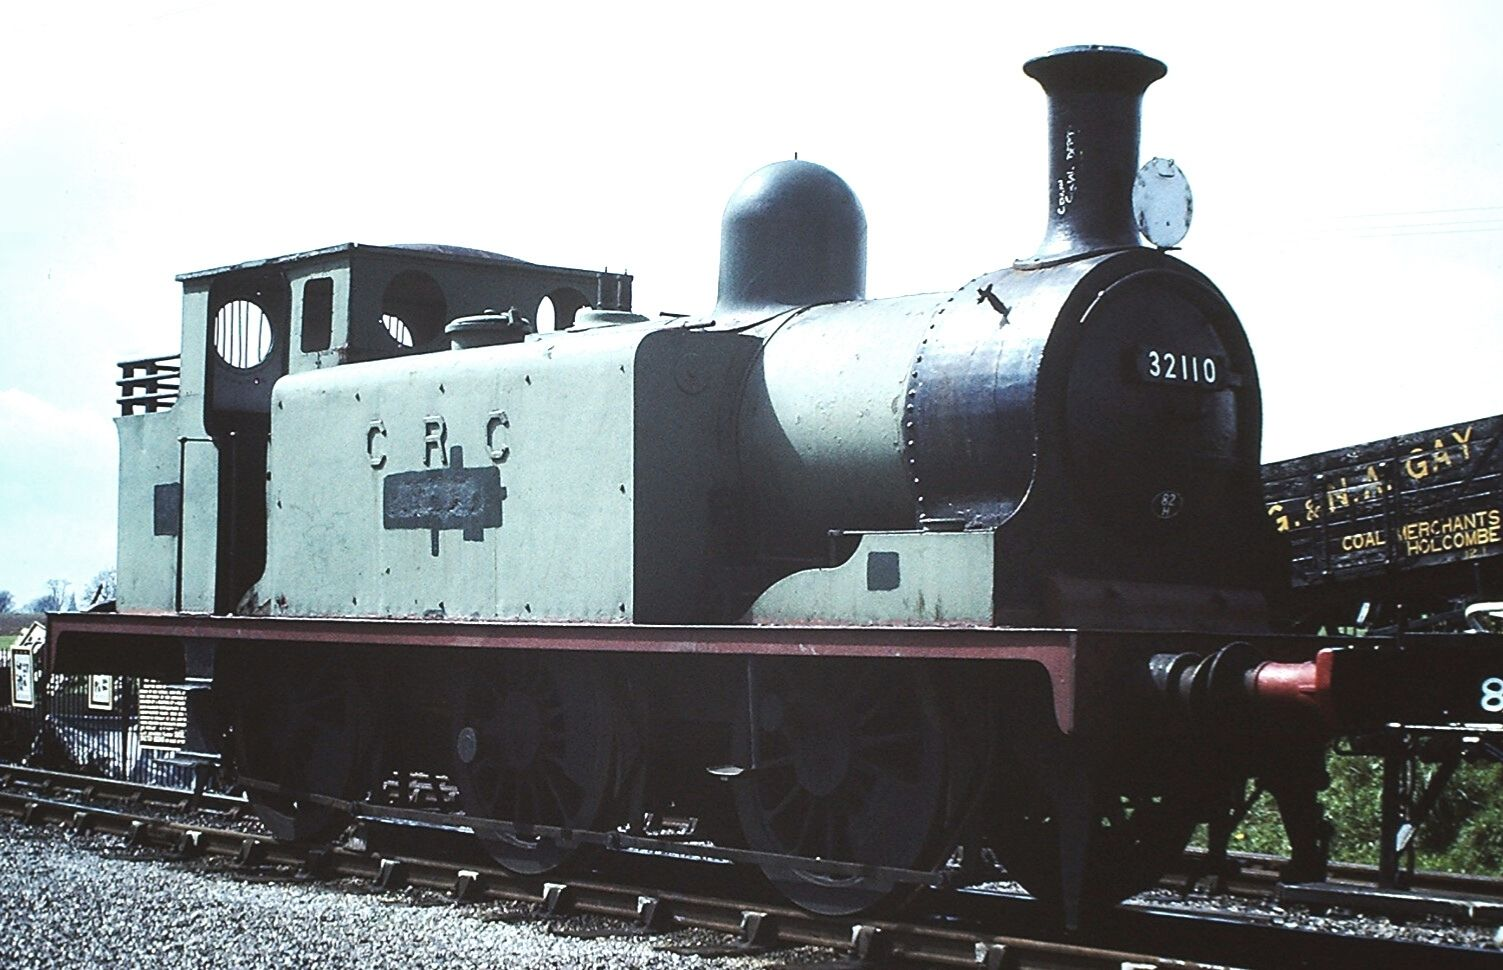 32110 'Burgundy' at Cranmore on the East Somerset Railway in May 1981. ©Hugh Llewelyn